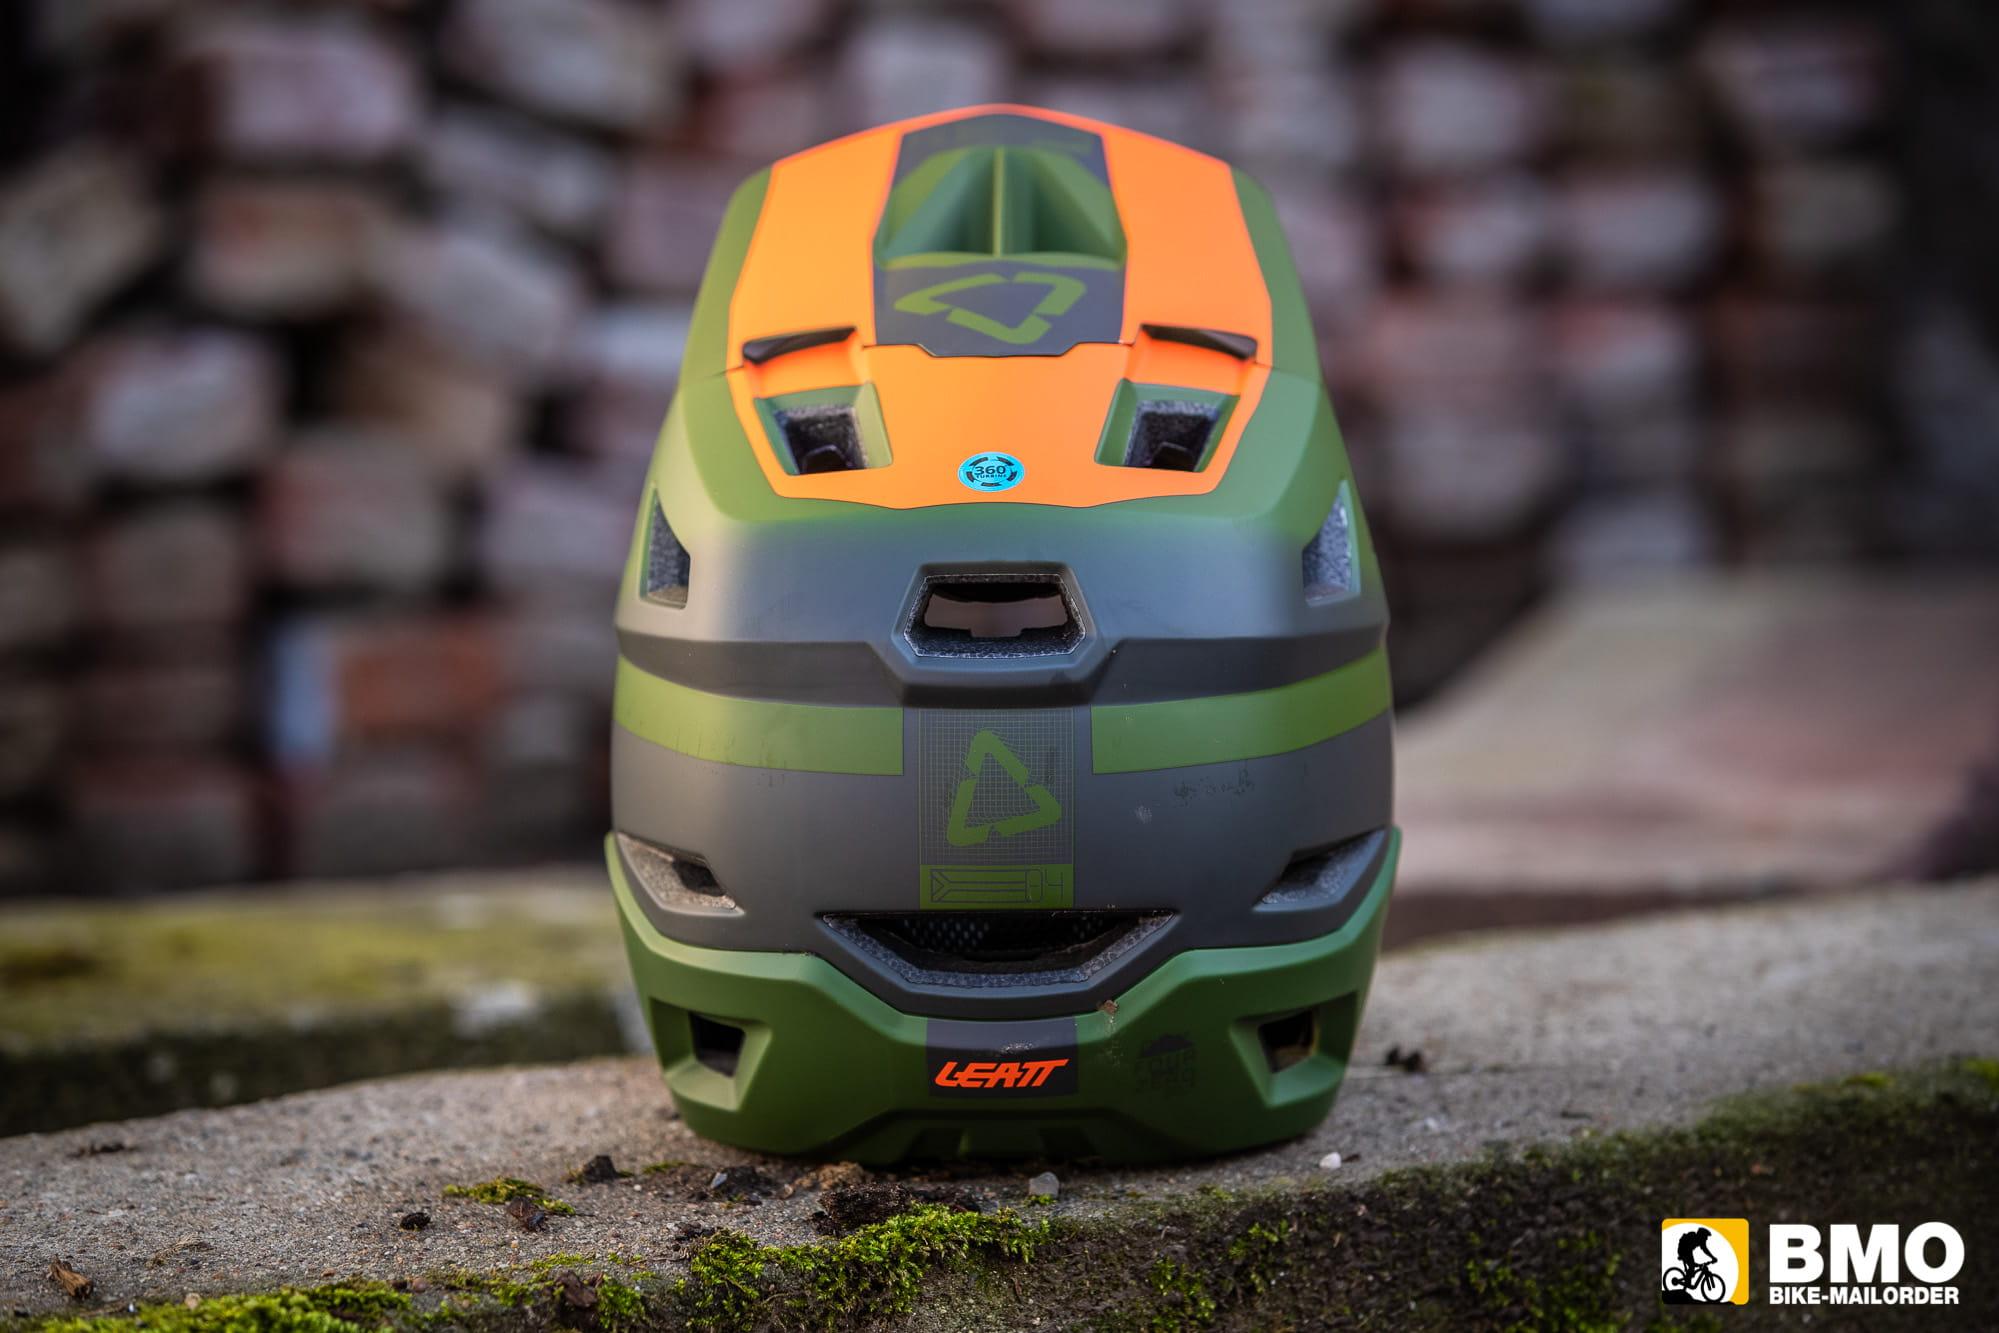 Leatt-DBX-4-0-Super-Ventilated-Fullface-Helm-Bike-Mailorder-13